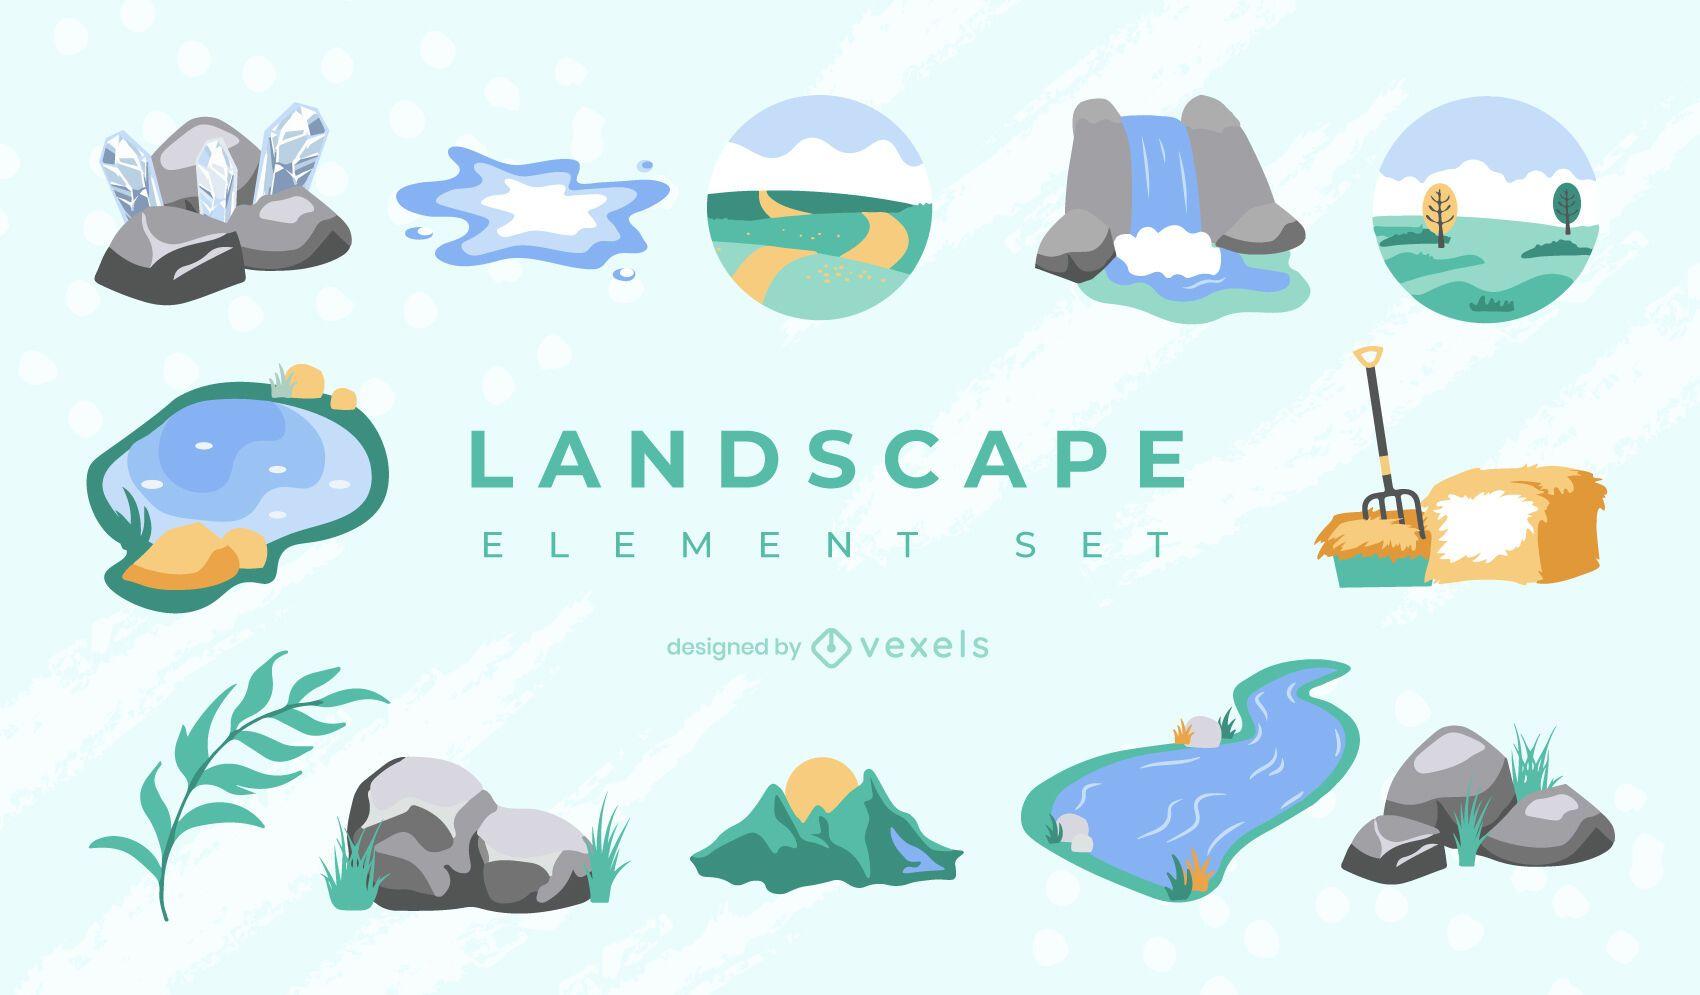 Landscape element semi-flat set